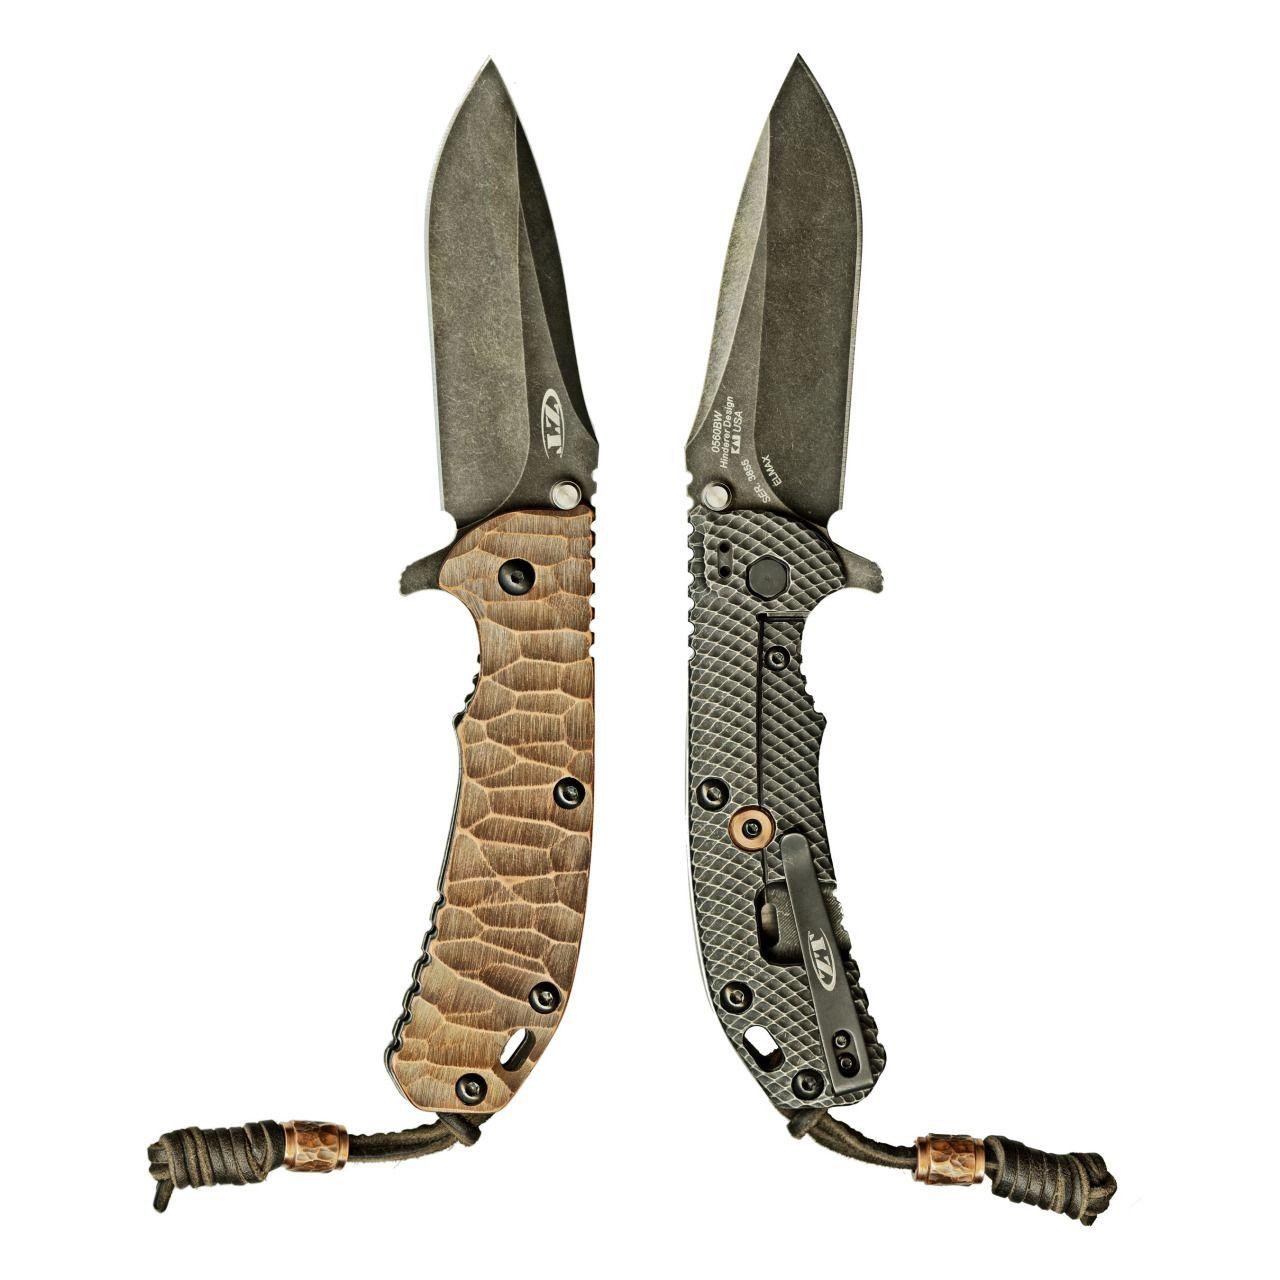 EDC Knife: Zero Tolerance 560 BW with custom stone pattern